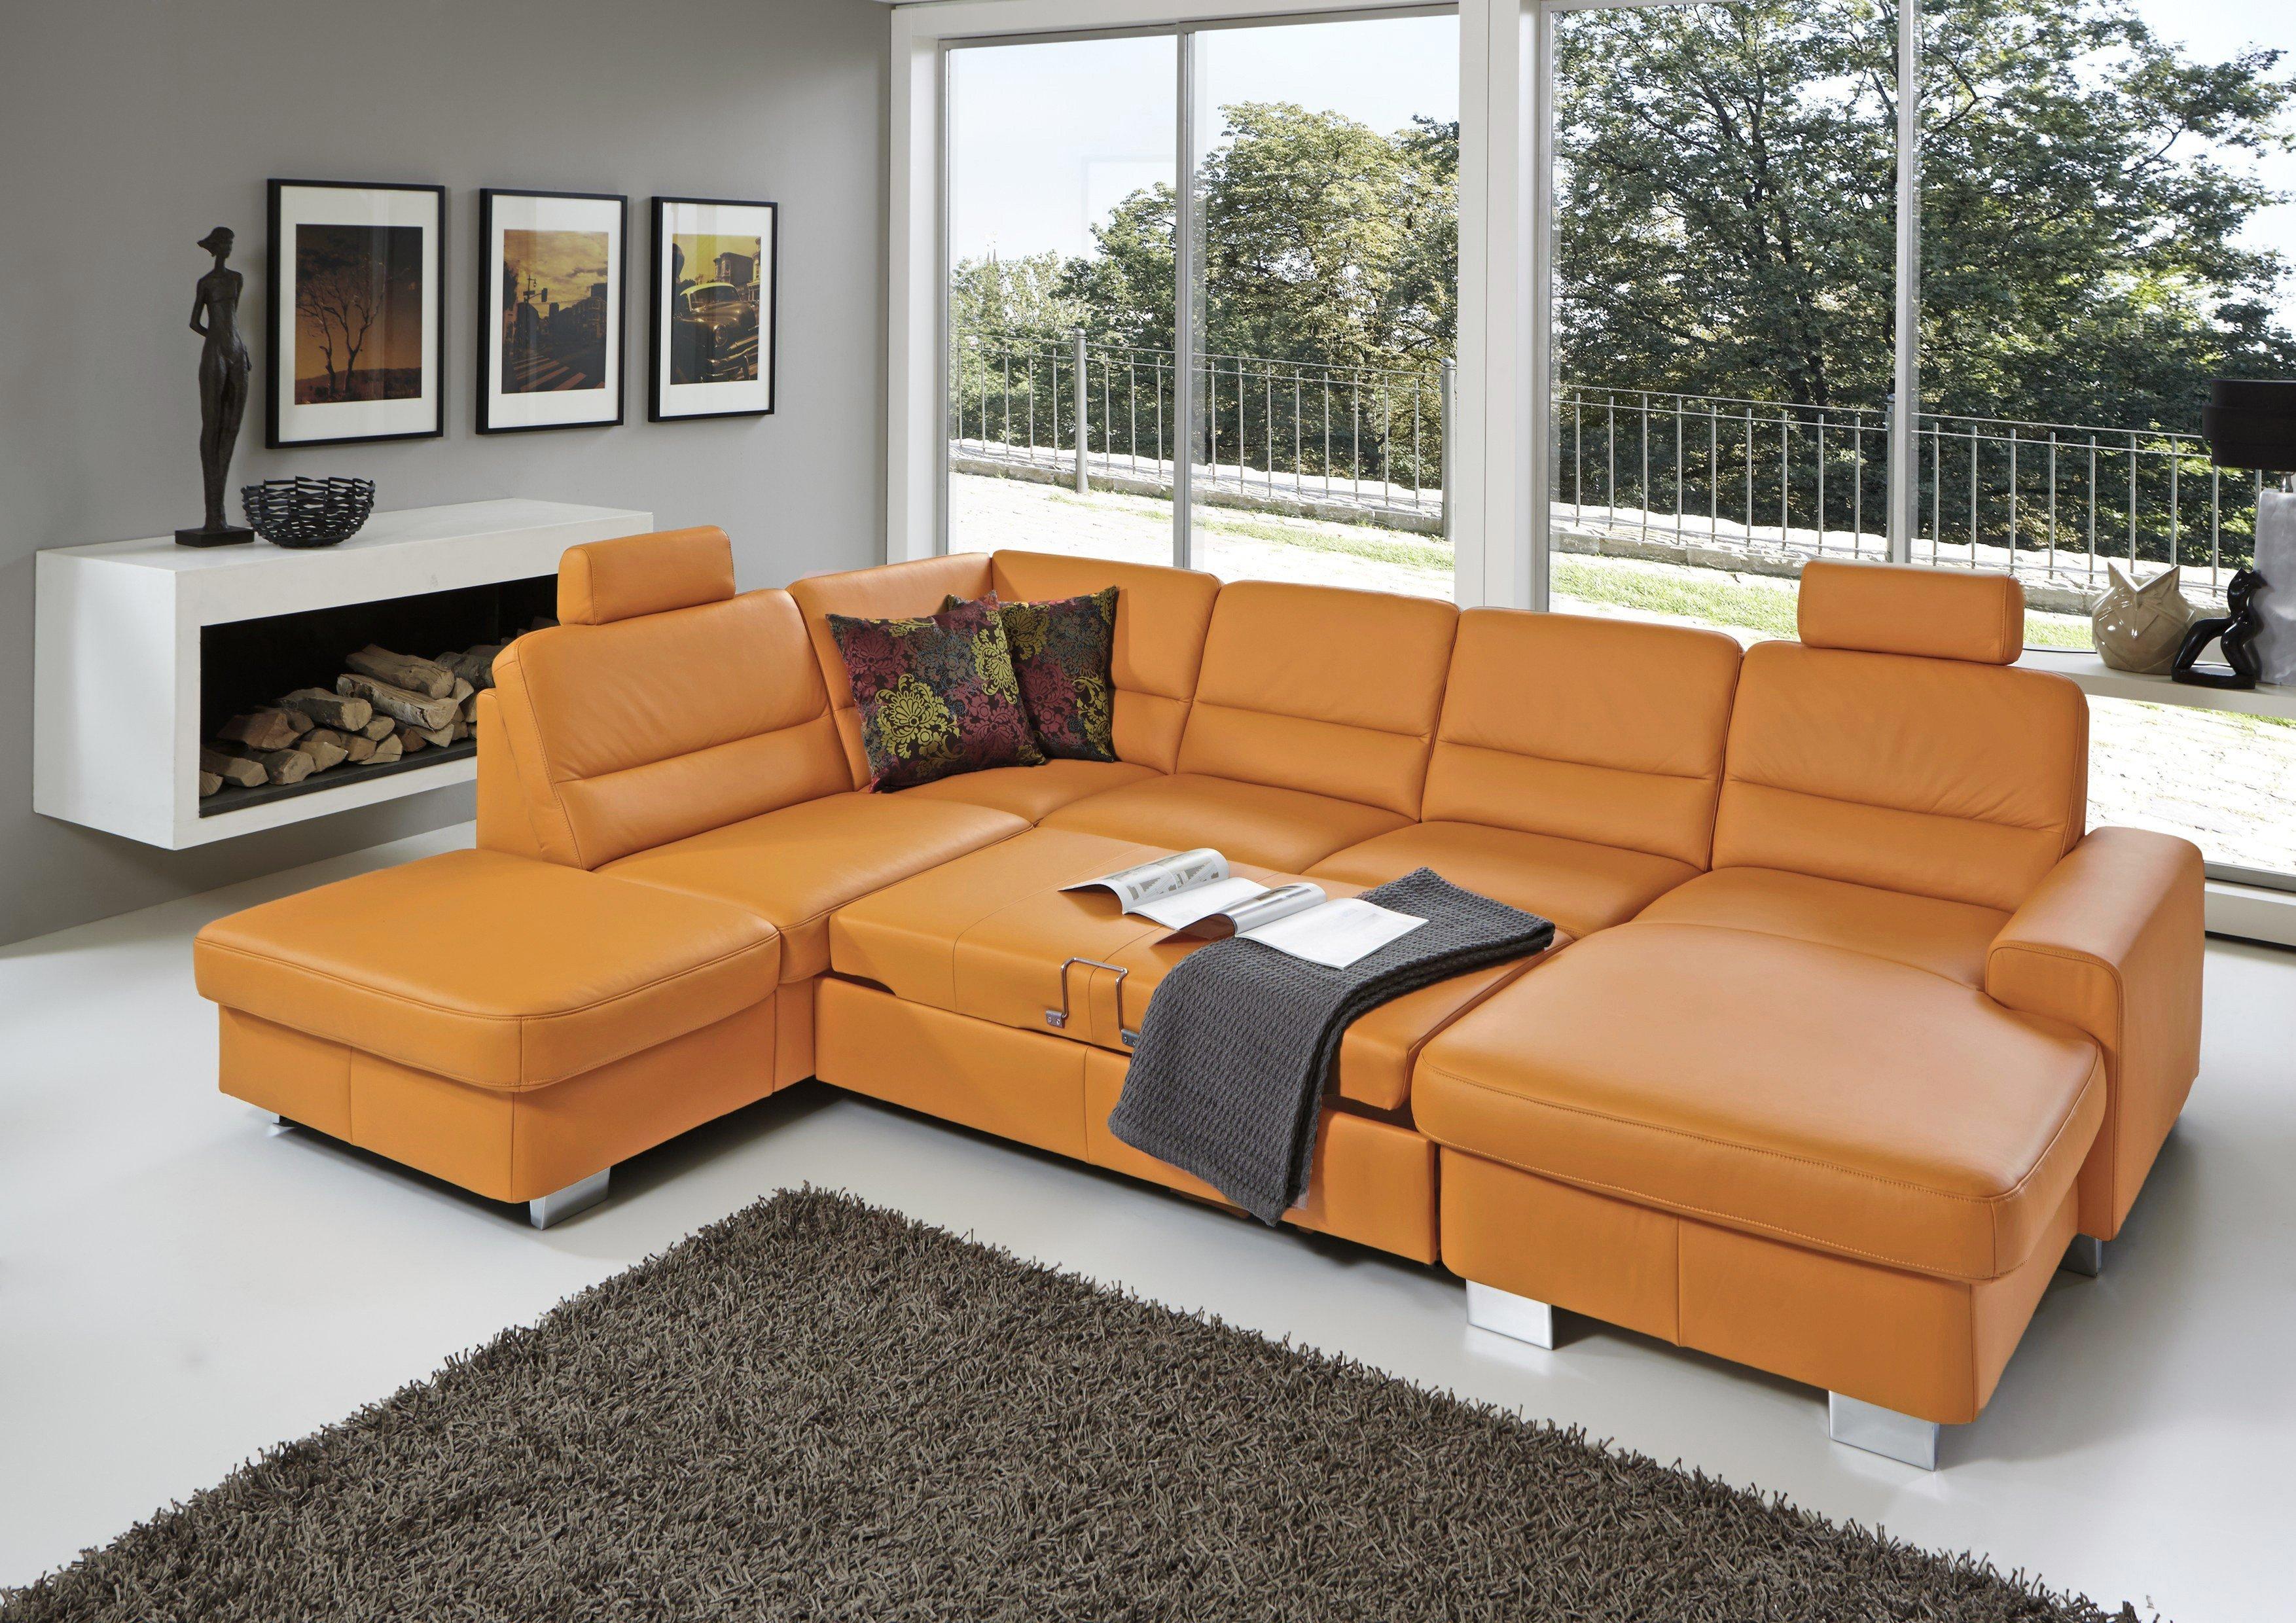 polinova andorra wohnlandschaft curry m bel letz ihr online shop. Black Bedroom Furniture Sets. Home Design Ideas